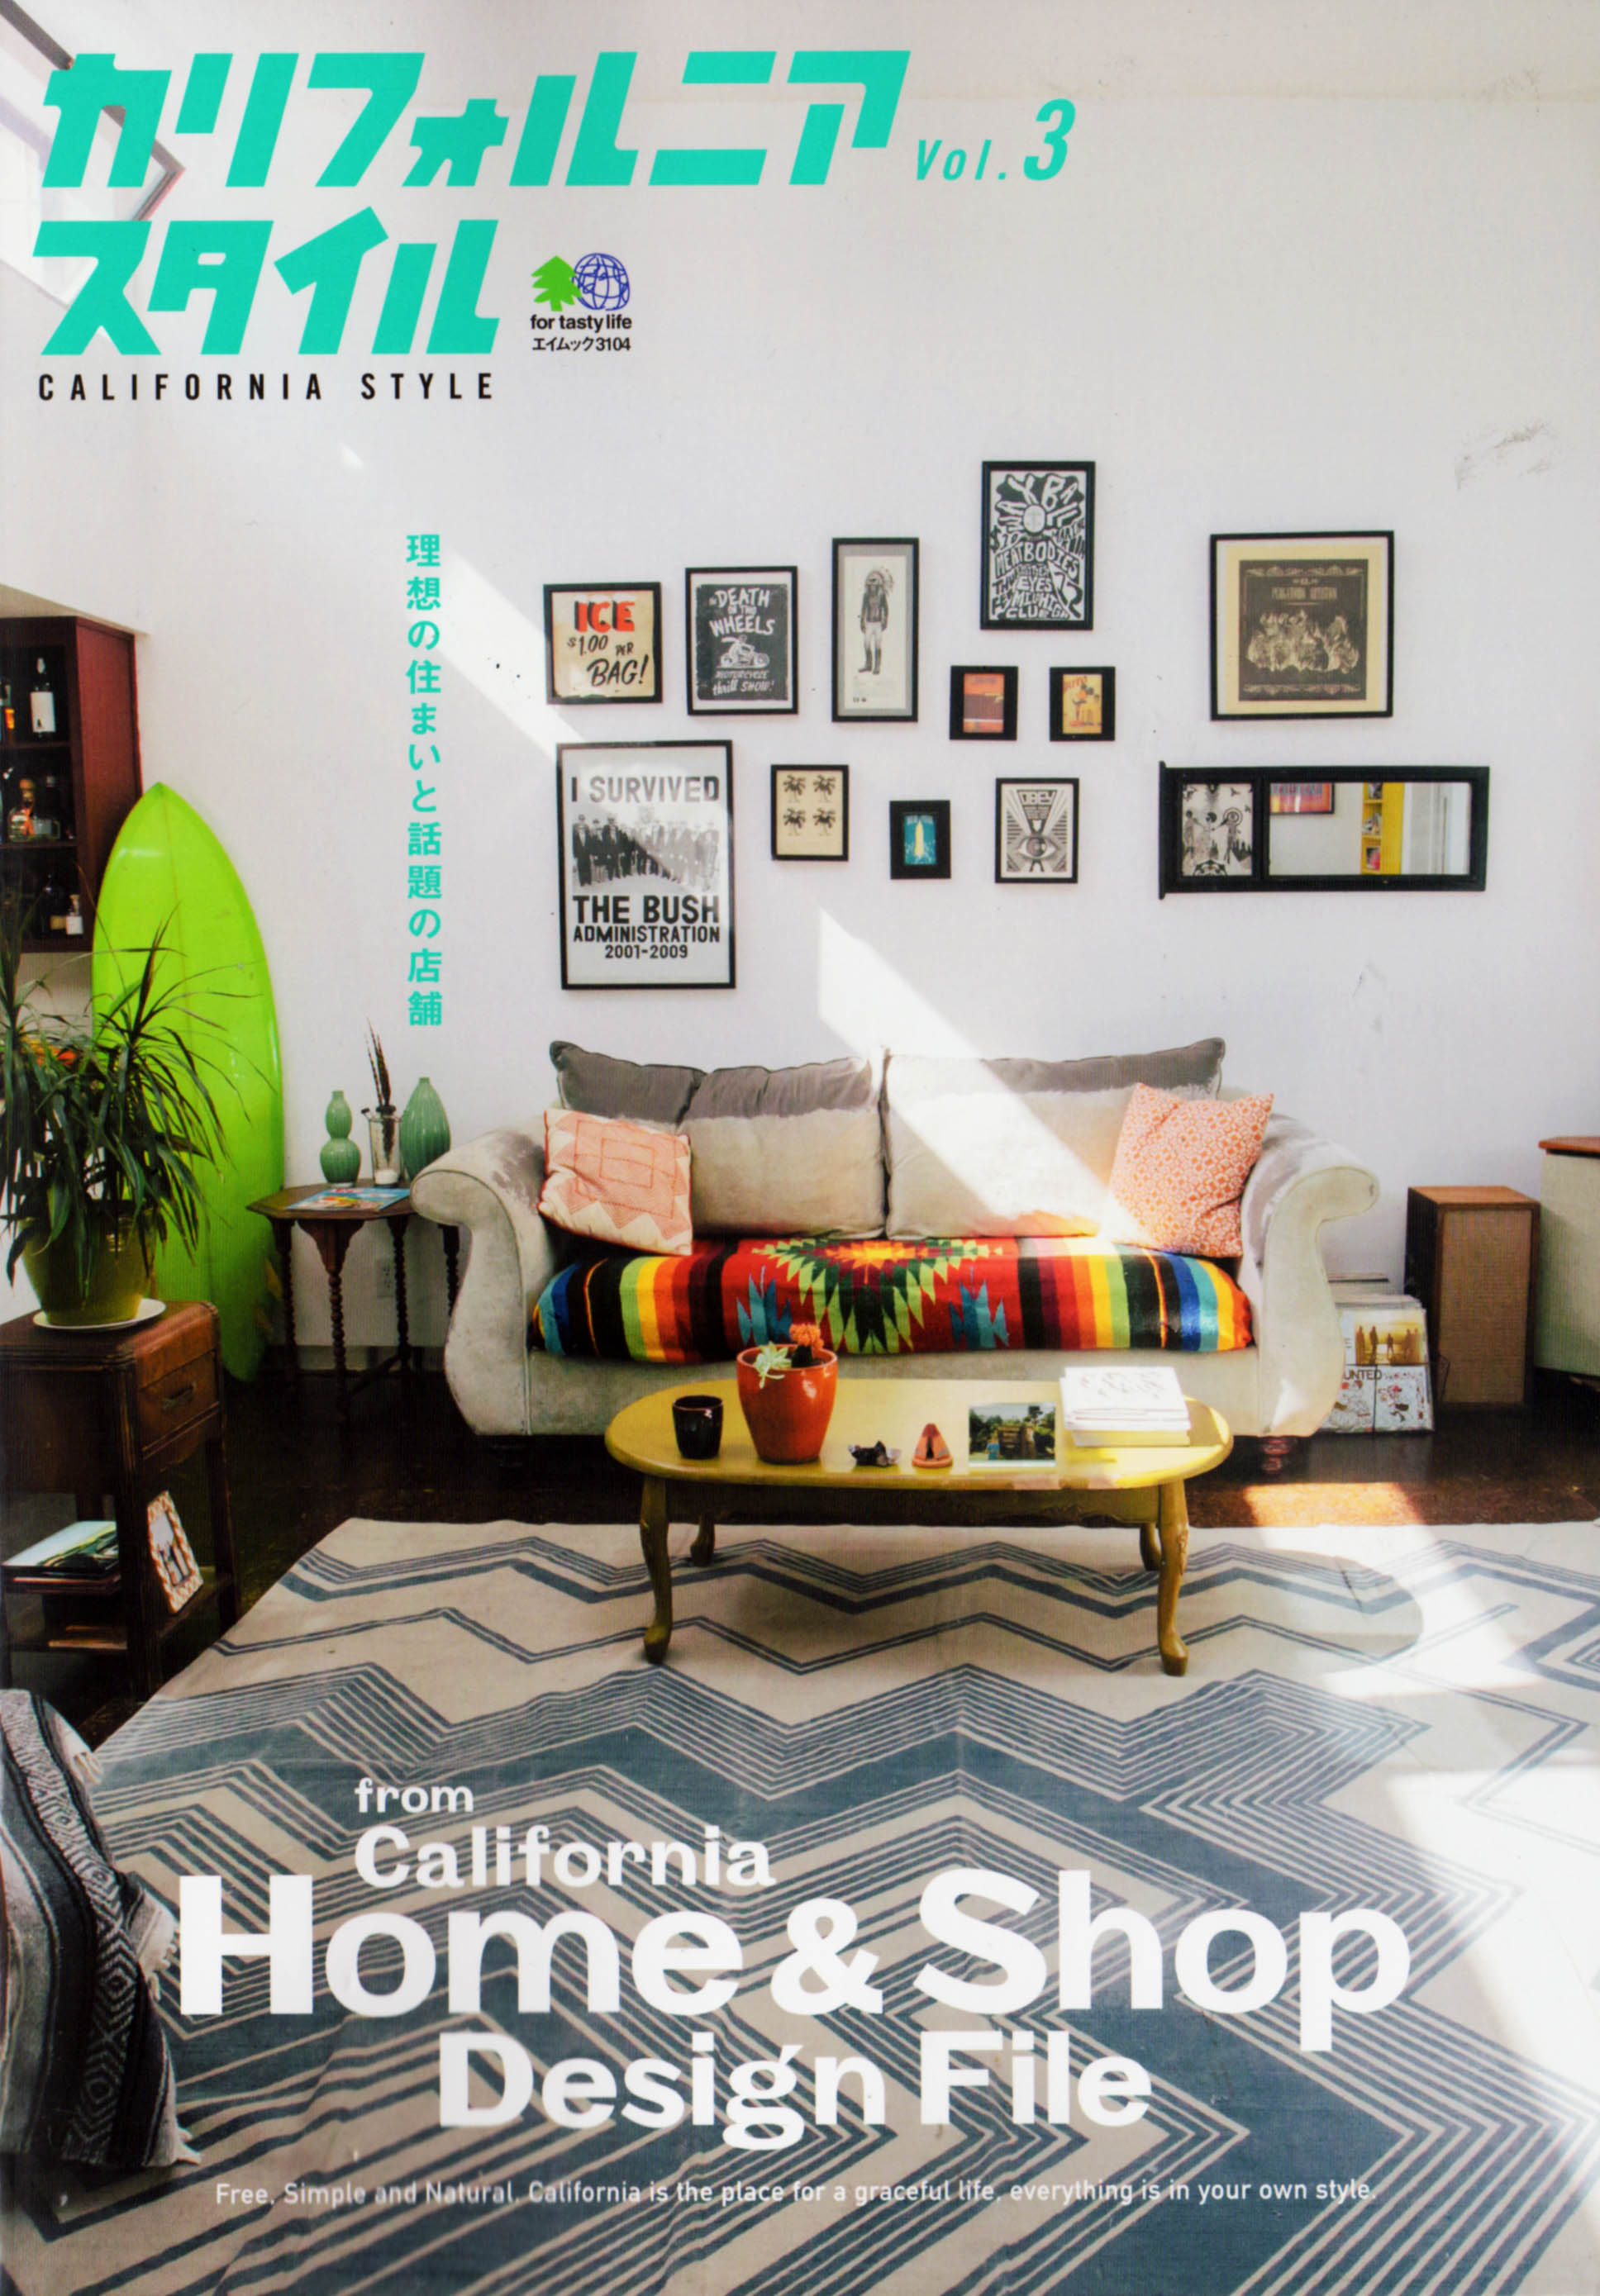 California Style Vol. 3